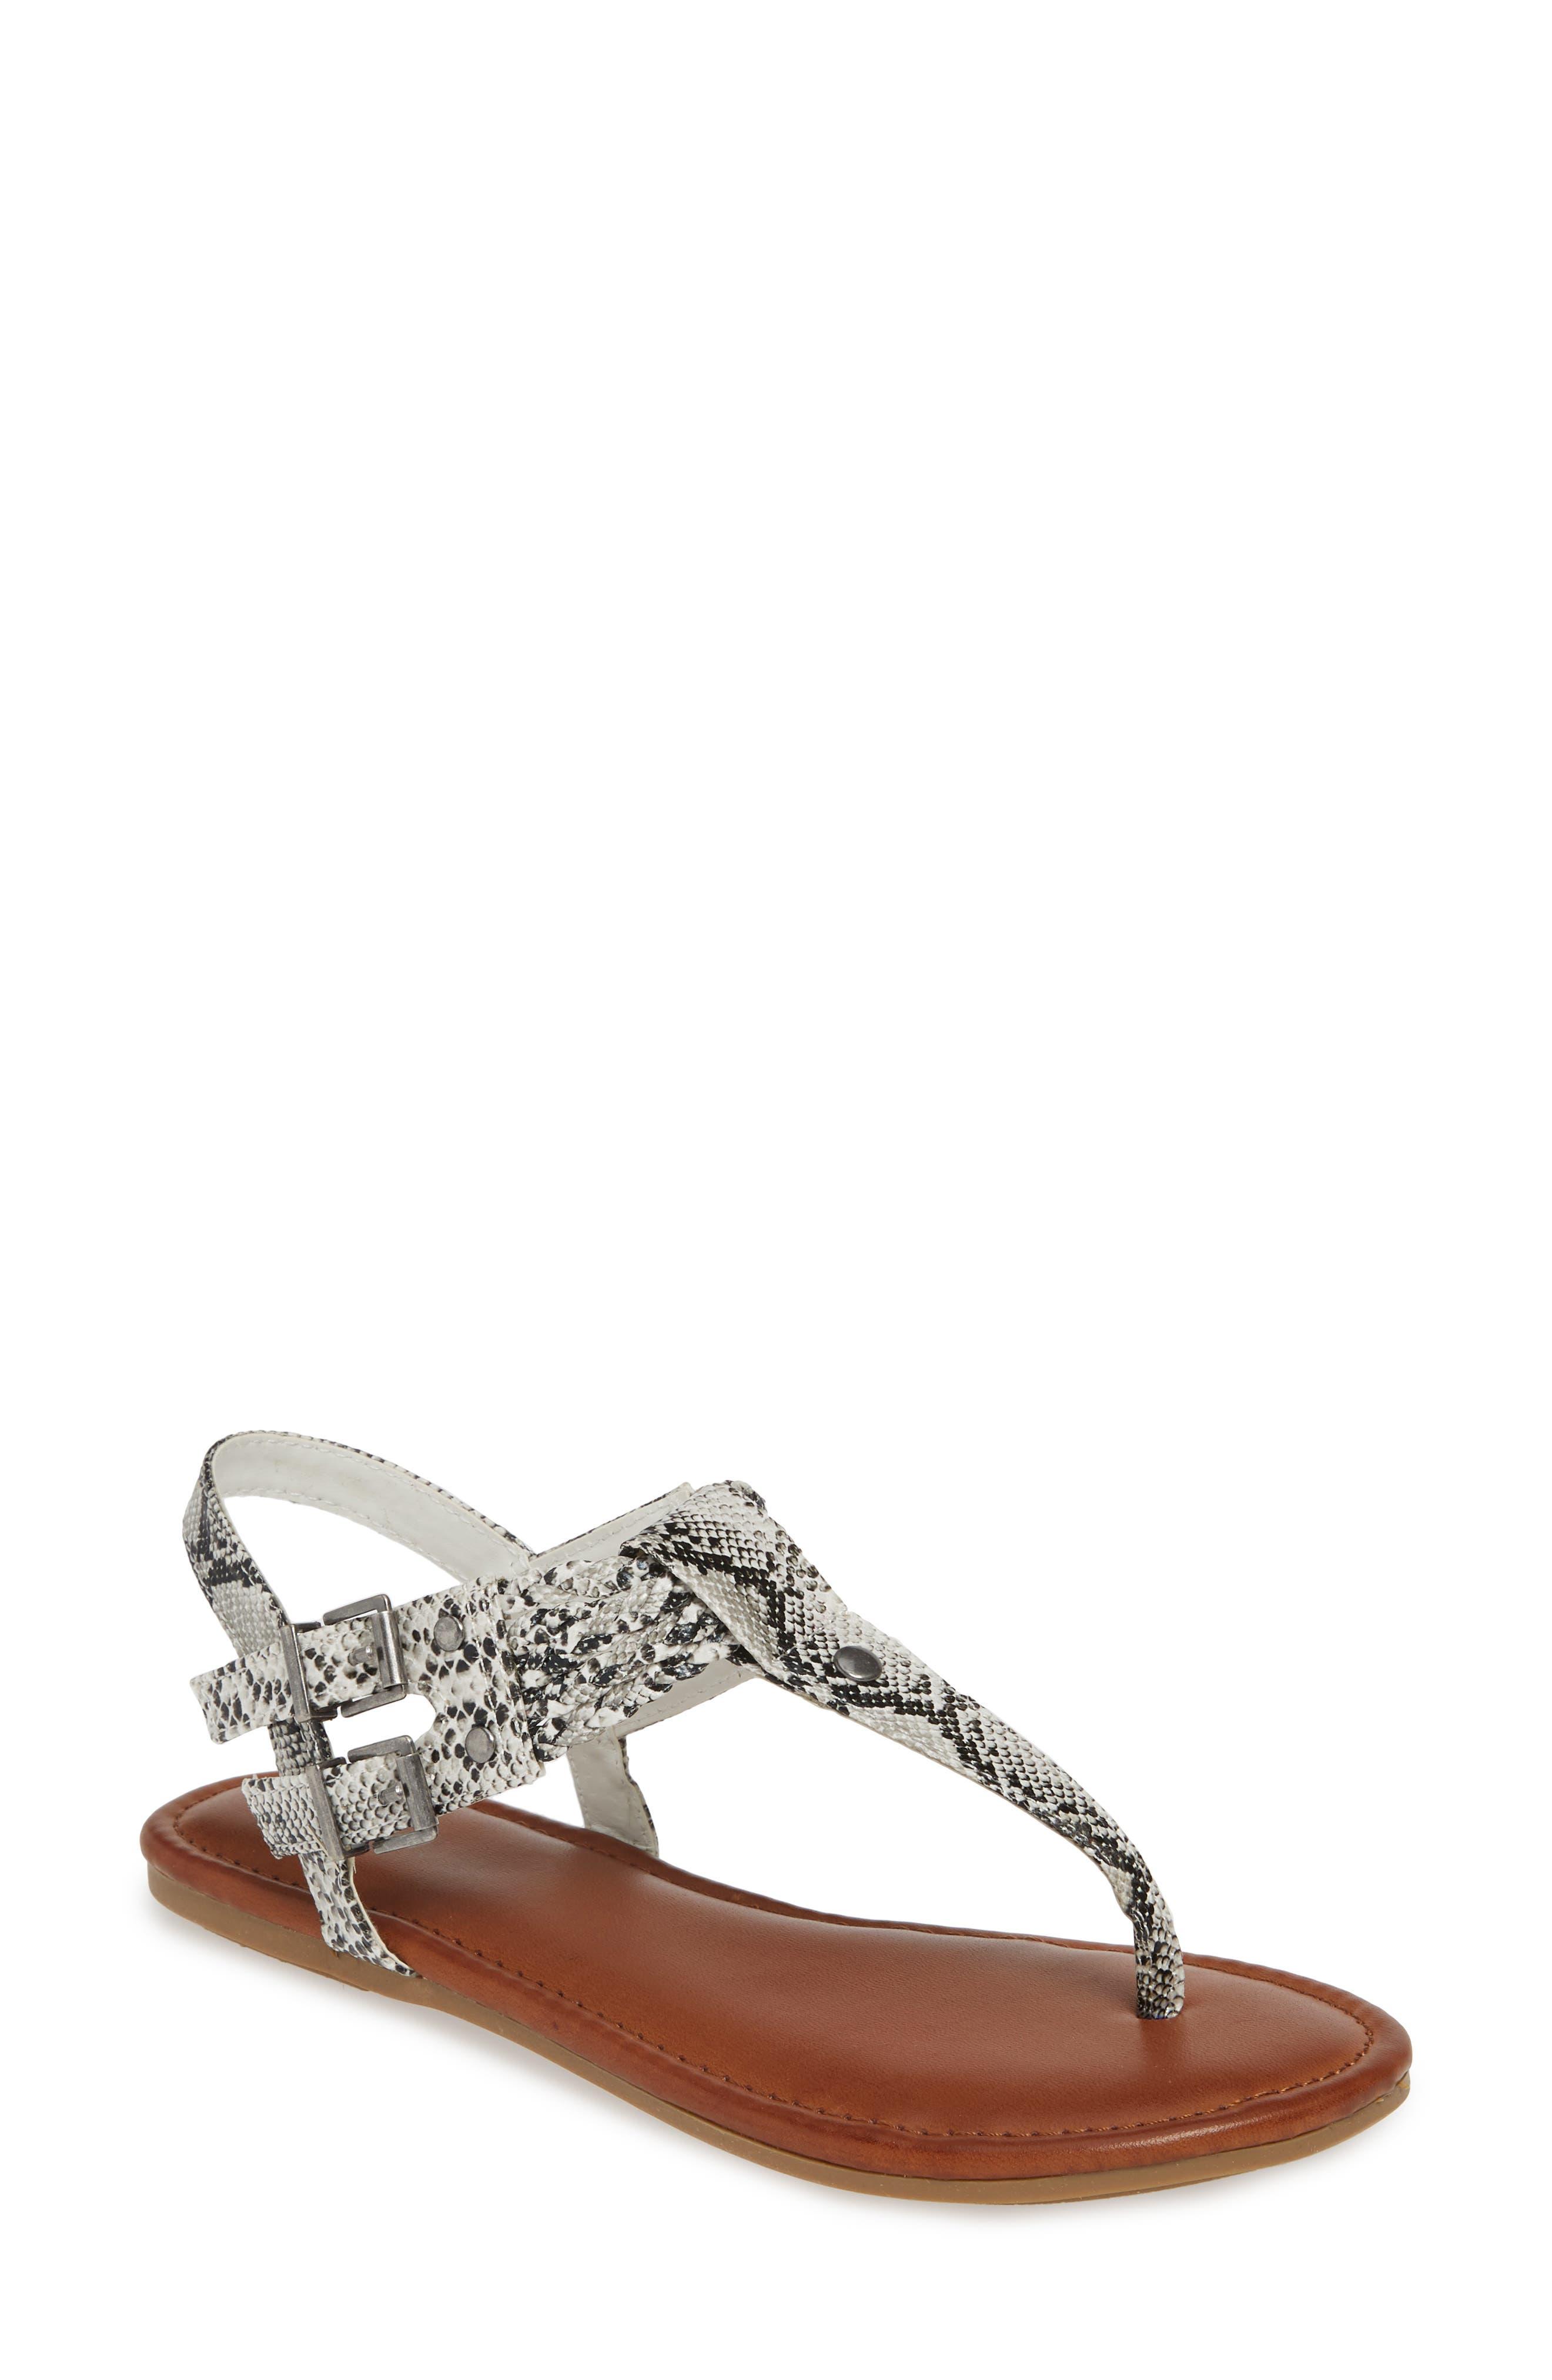 Mia Martha Double Buckle Sandal- White